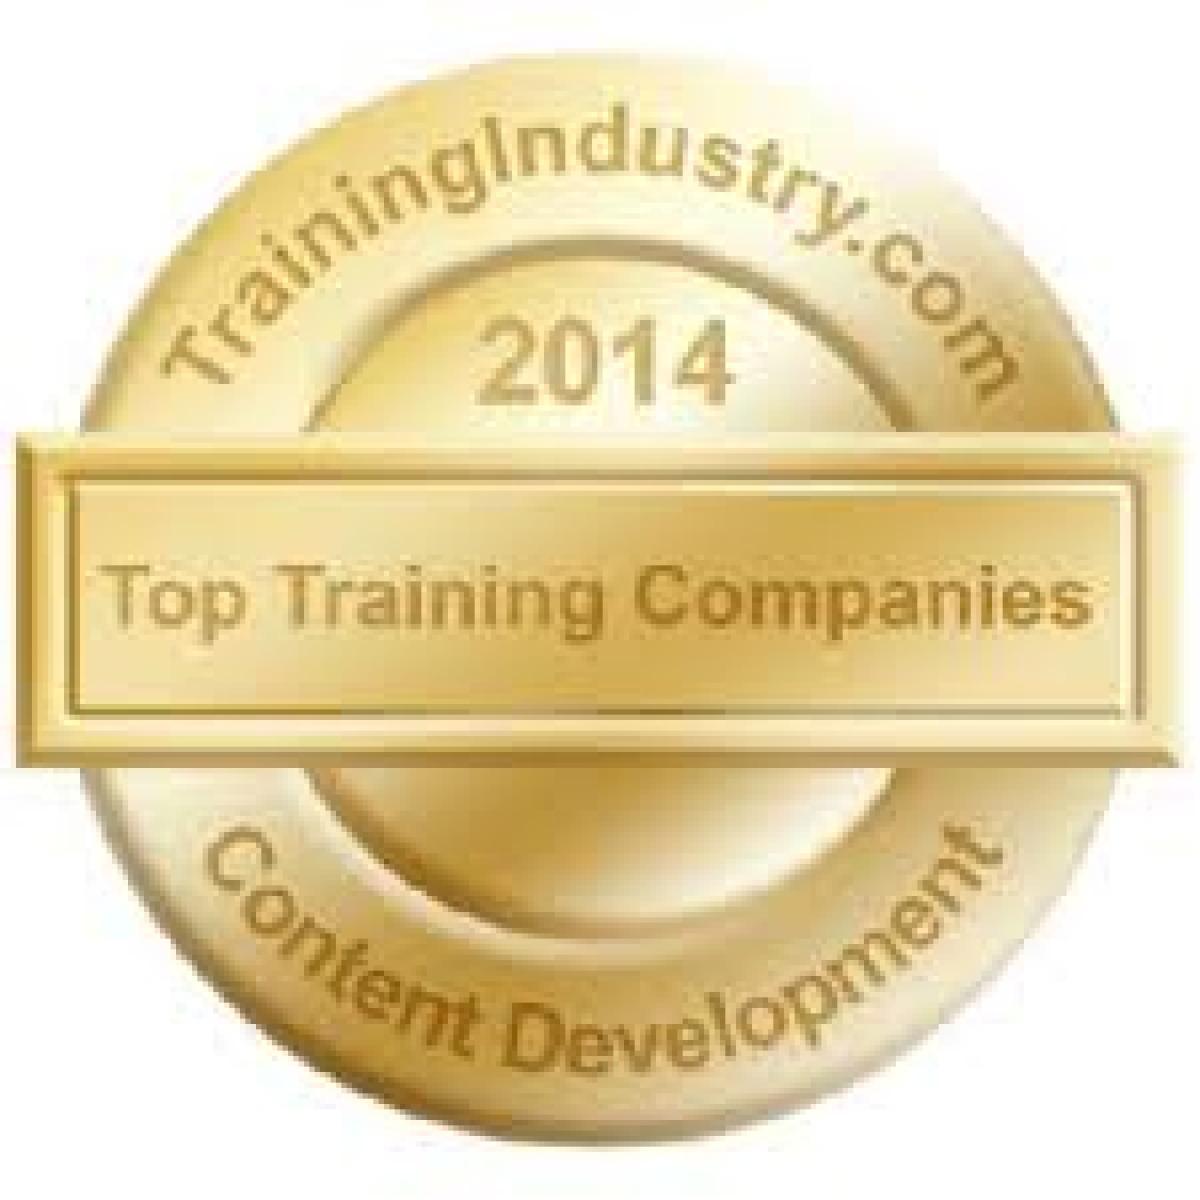 NIIT Named to TrainingIndustry.com's Top 20 Gamification Companies List